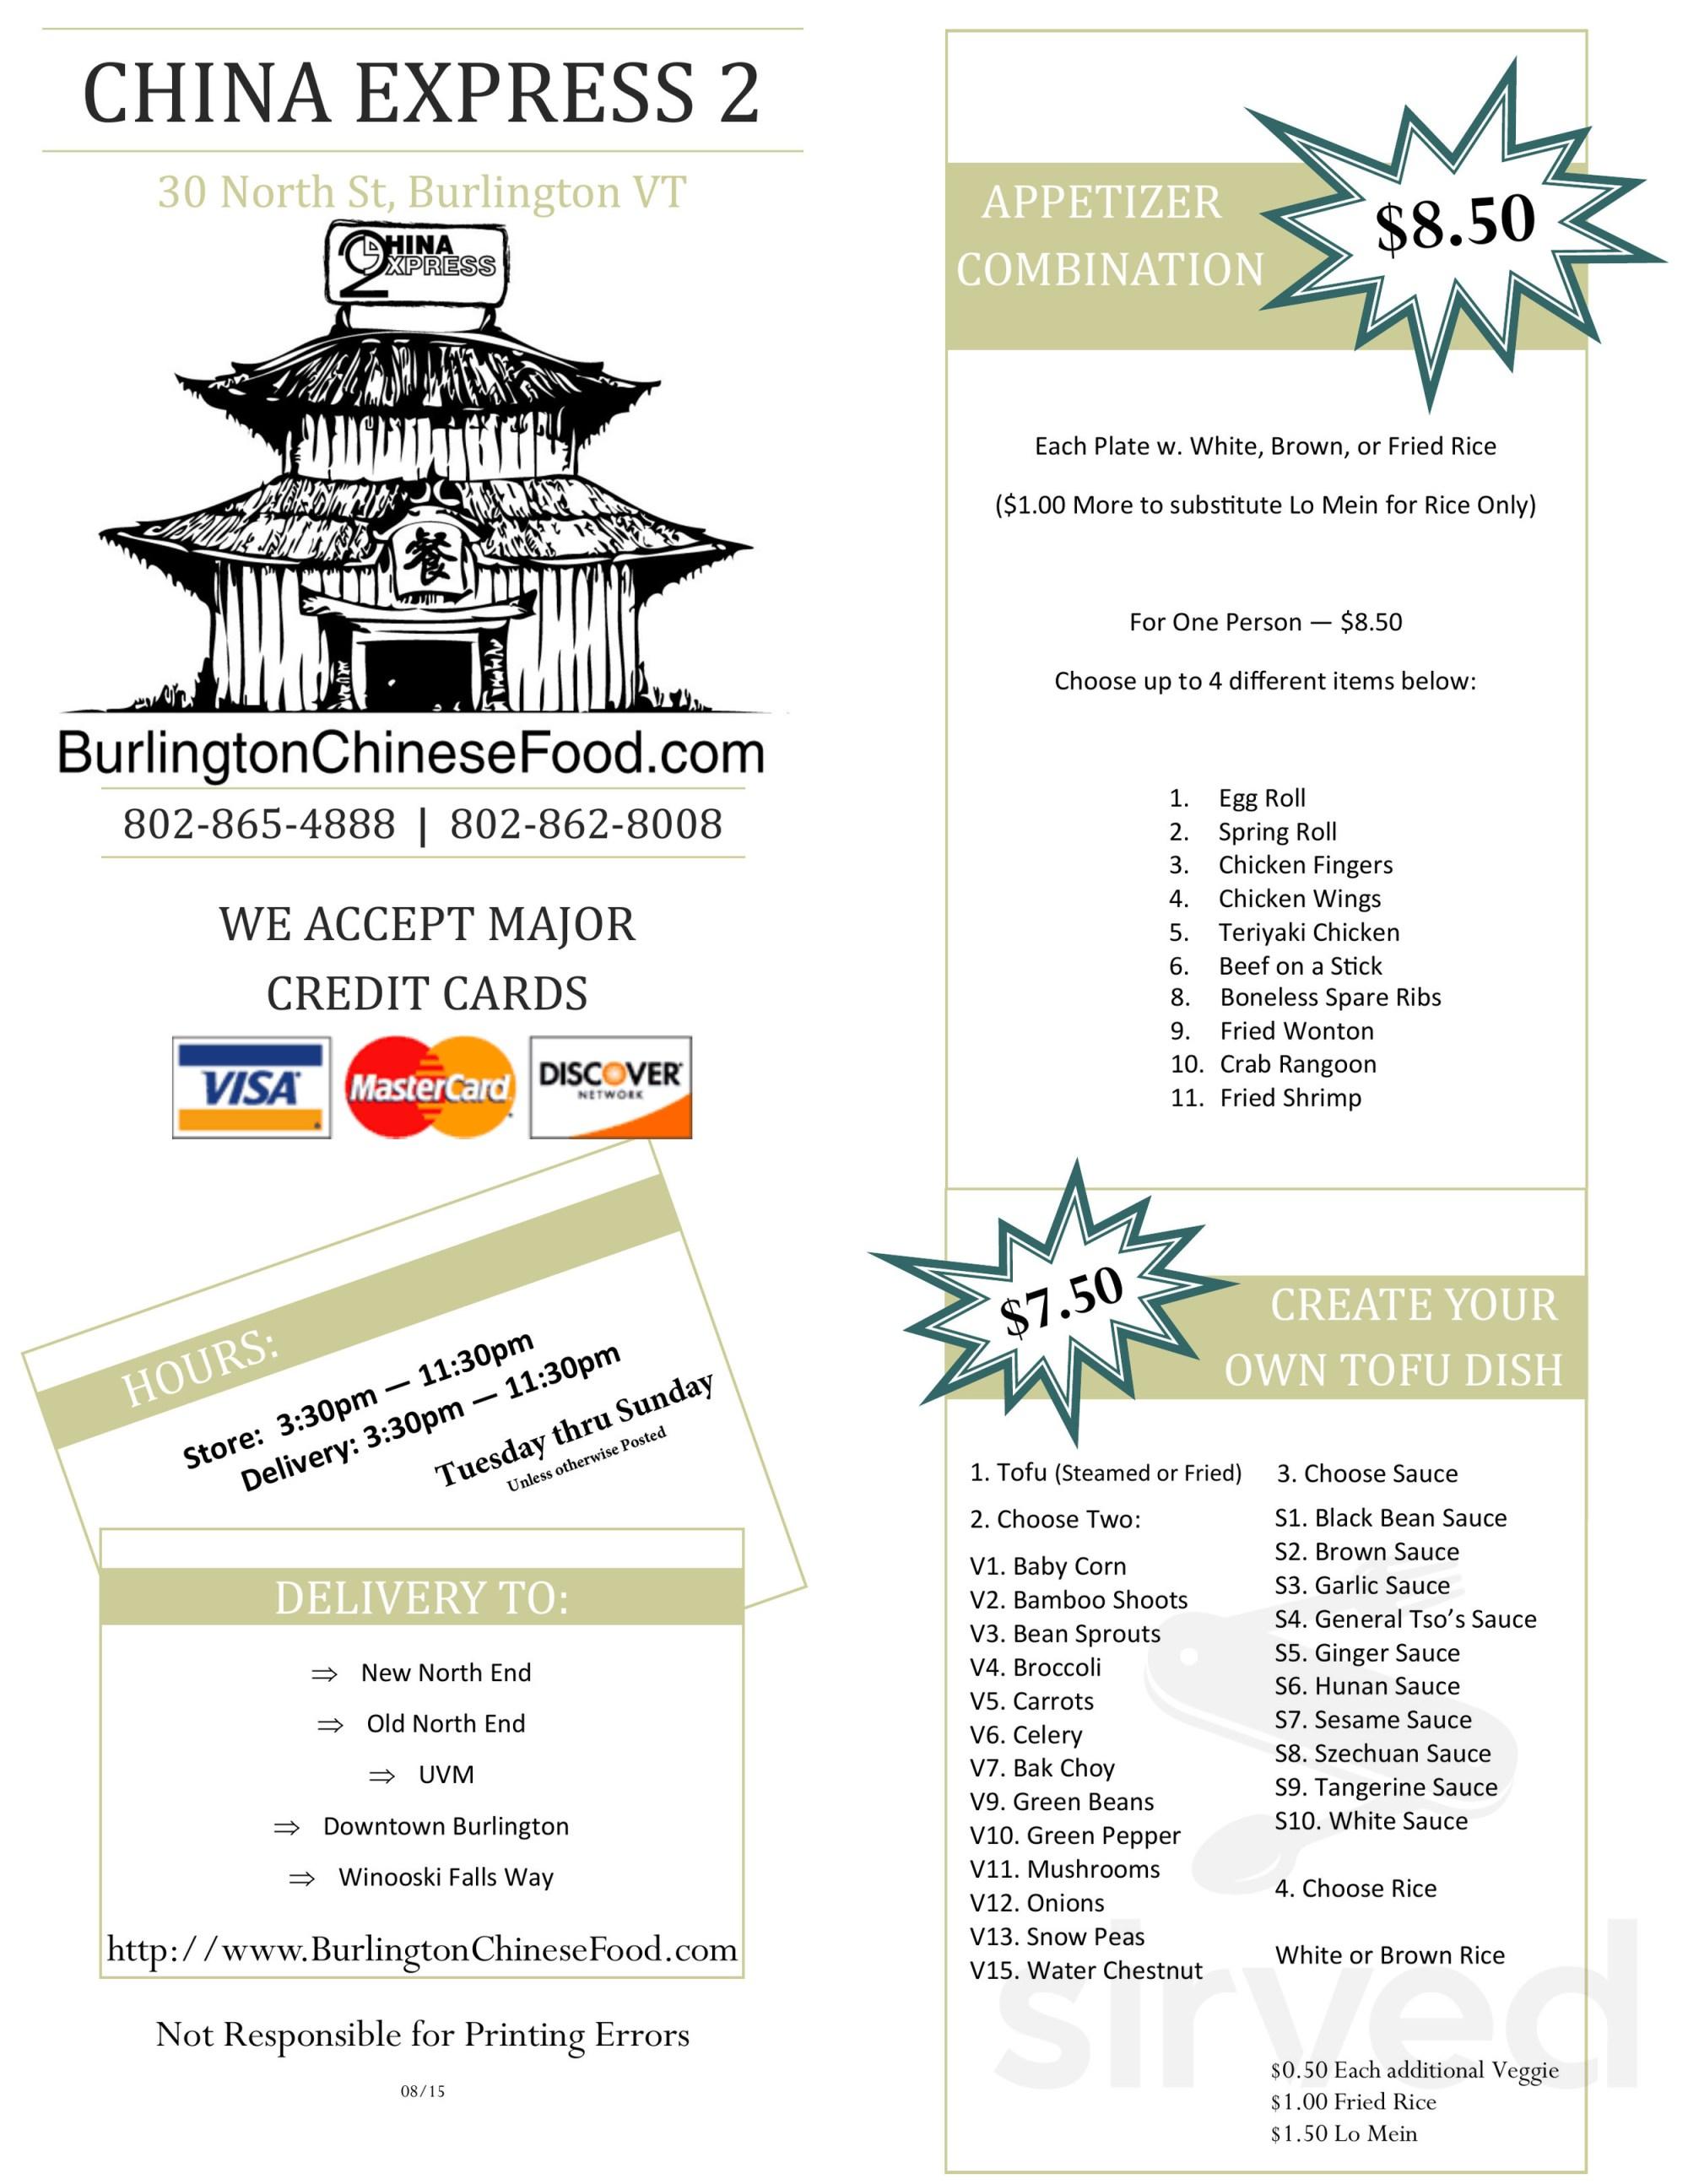 hight resolution of menu for china express 2 main menu page 1 of 4